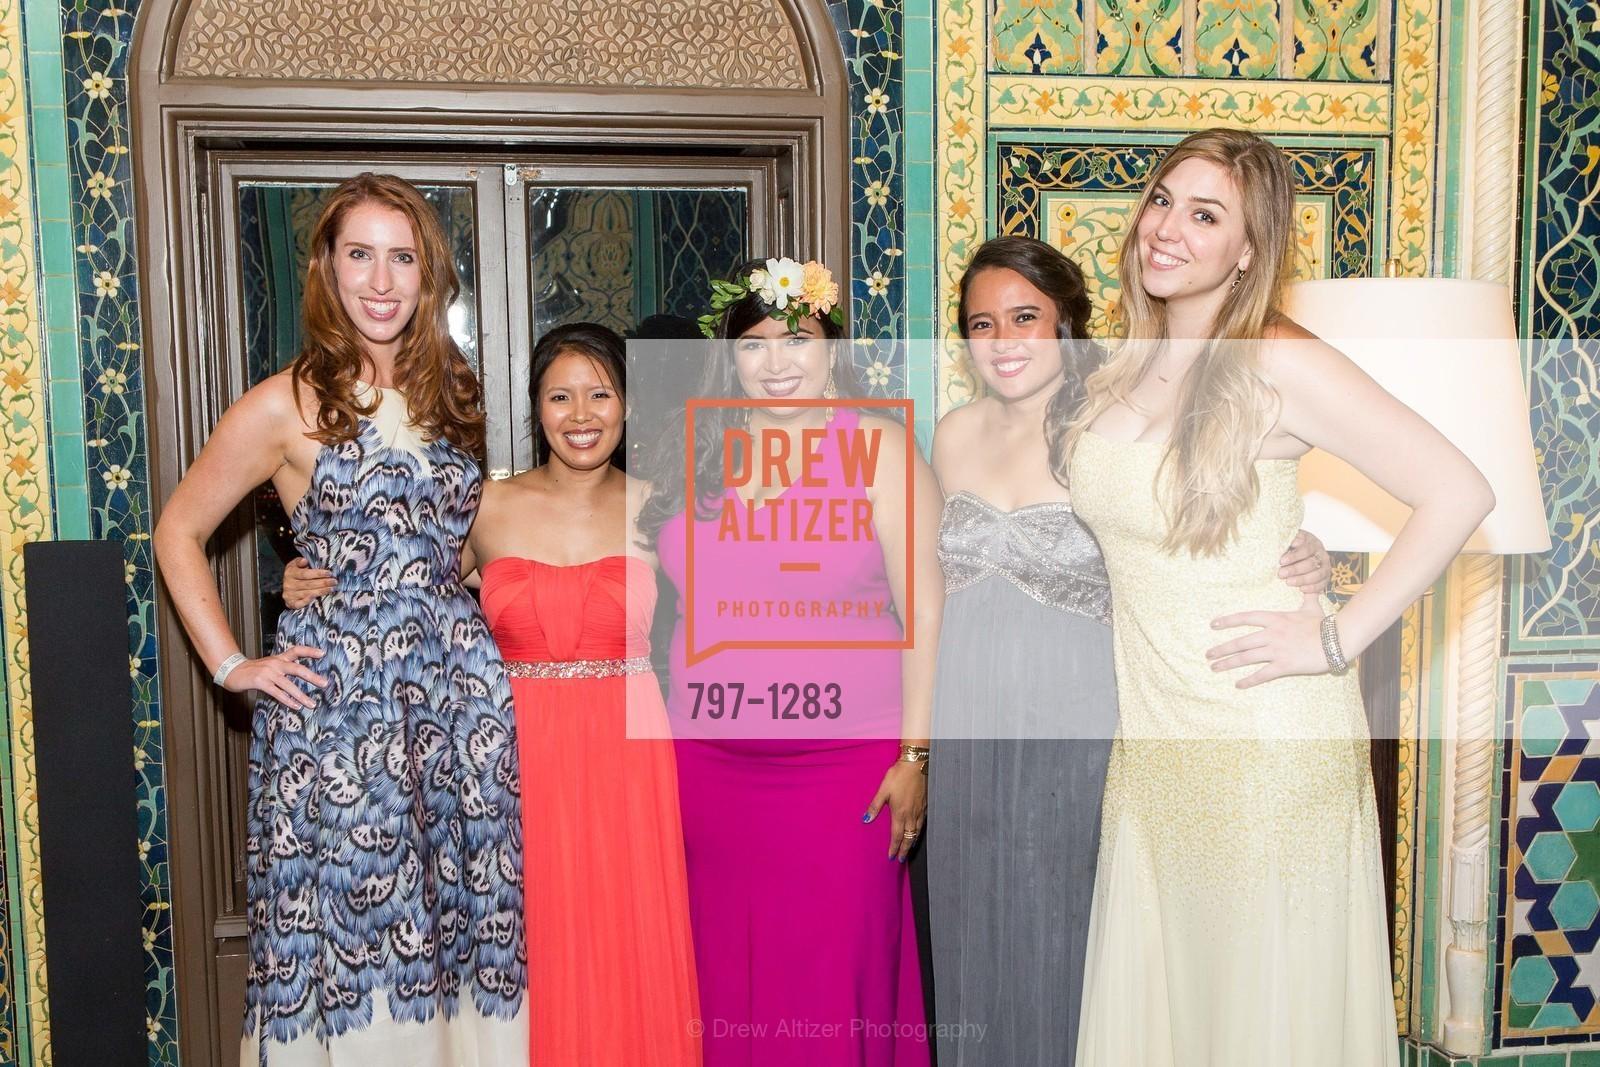 Casey Green, Janice On, Deyanira Medina, Cynthia Medina, Alyssa Nordstrom, Photo #797-1283